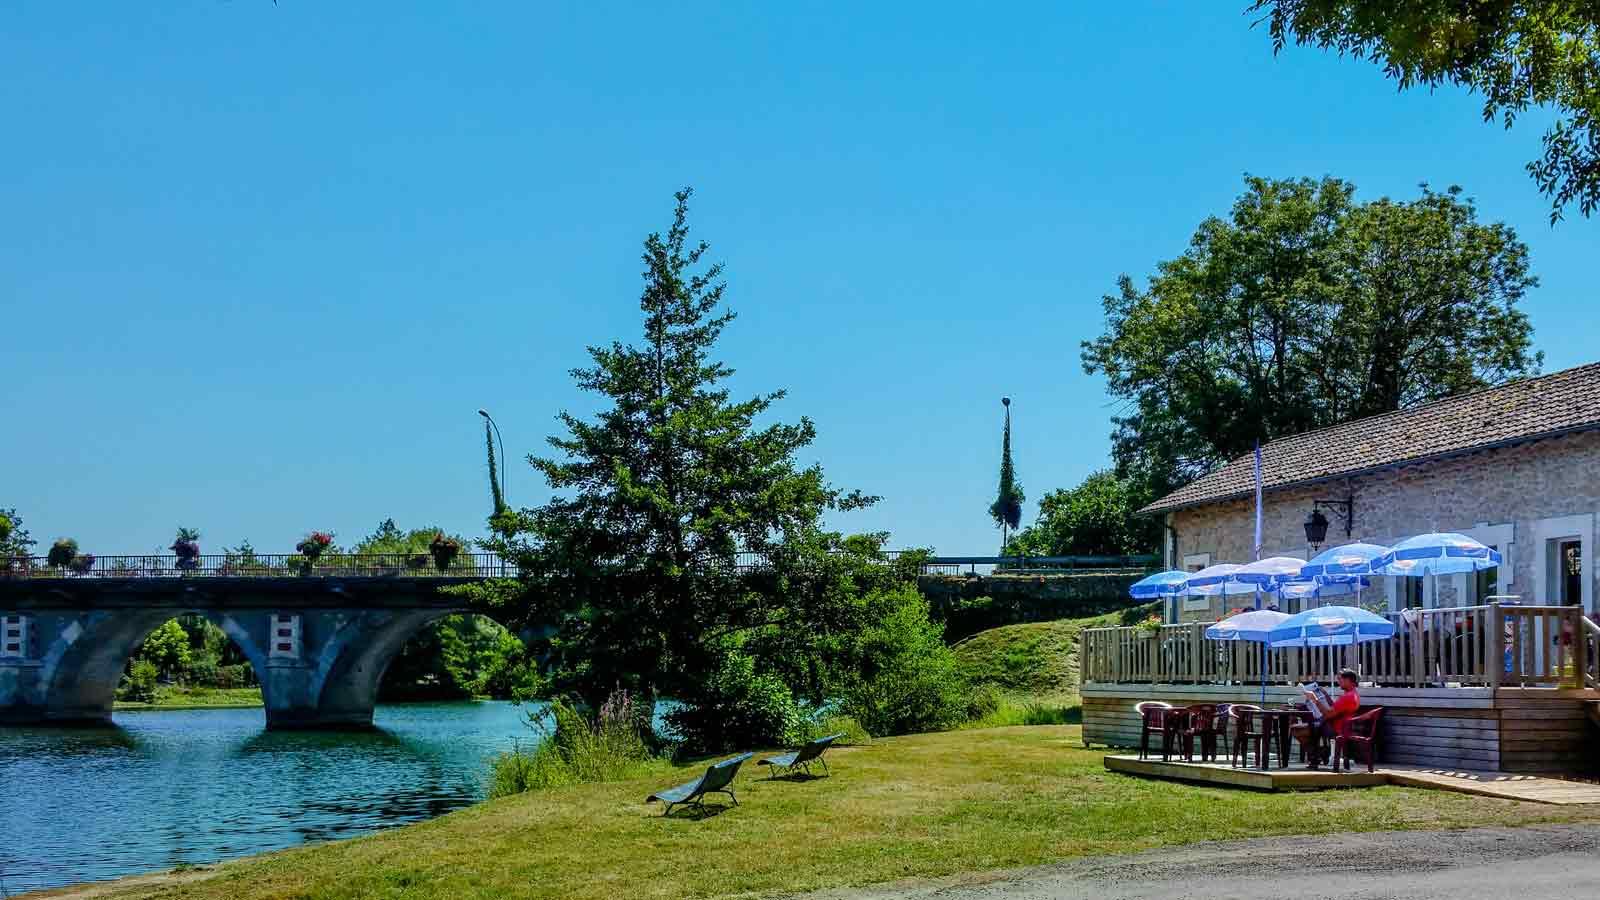 Vacances camping à Dordogne